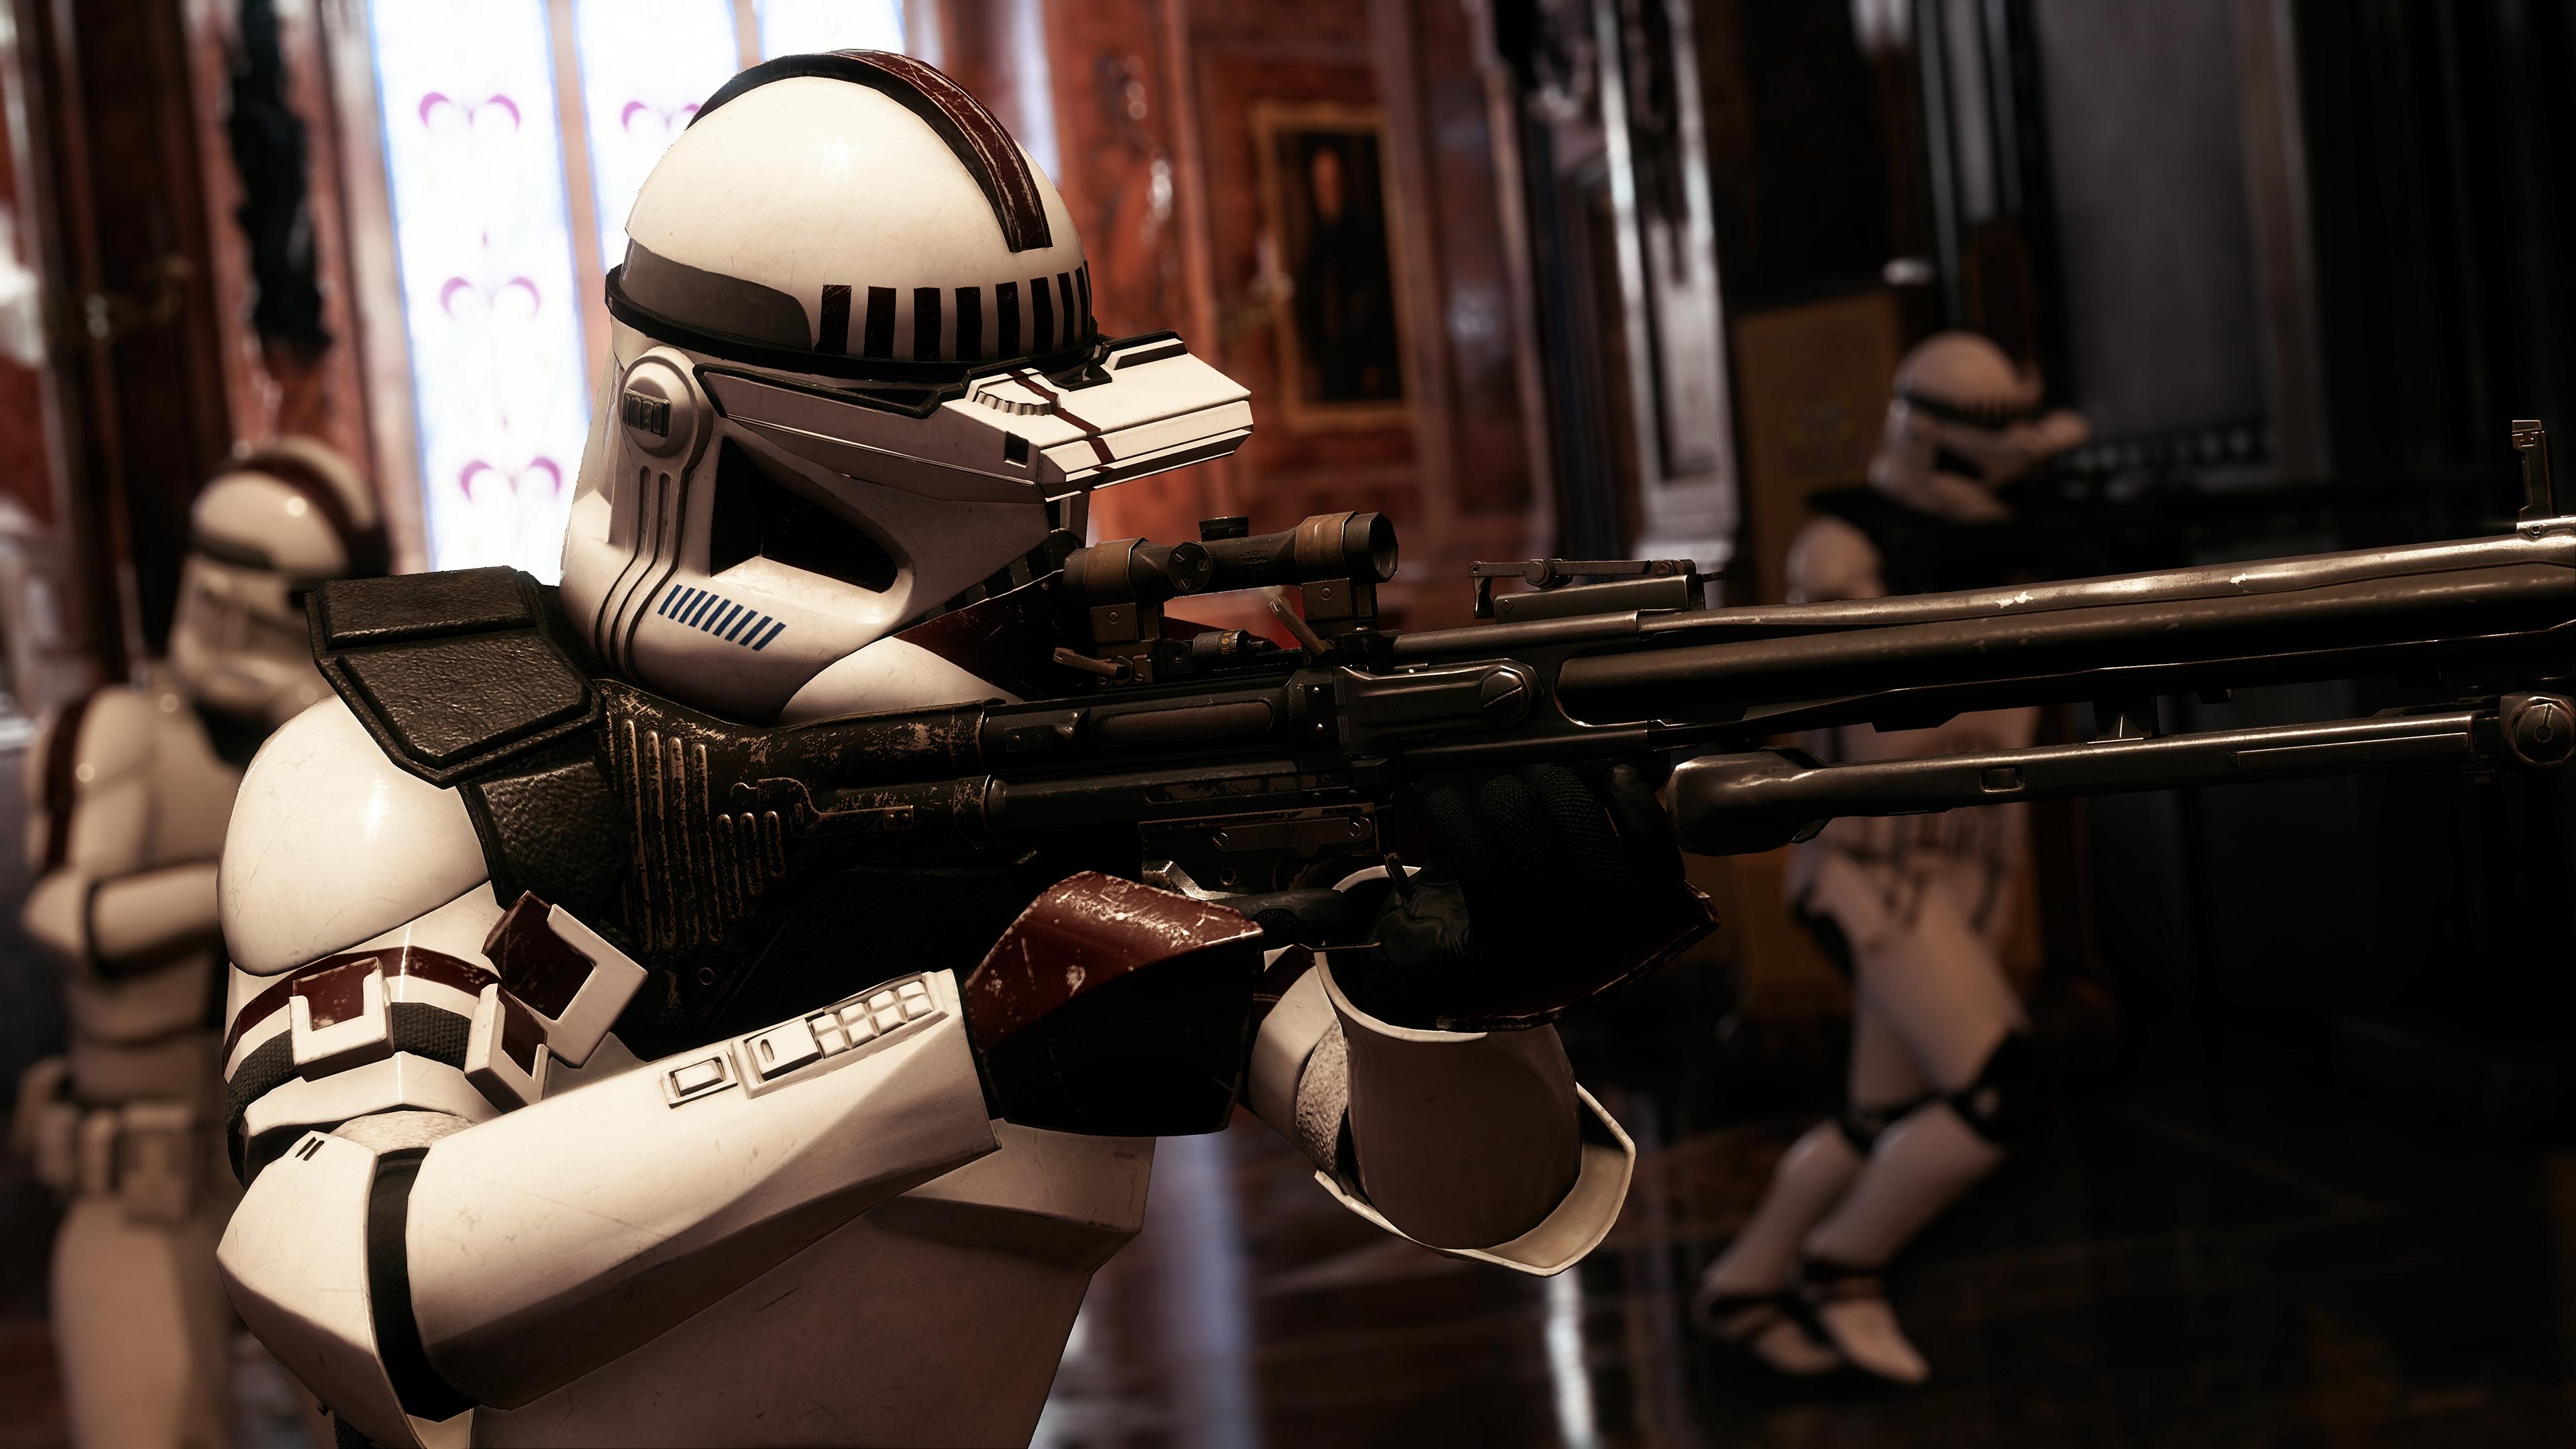 Wallpaper Star Wars Battlefront Ii Star Wars Video Games Clone Trooper Sniper Rifle 3840x2160 Poune 1477487 Hd Wallpapers Wallhere